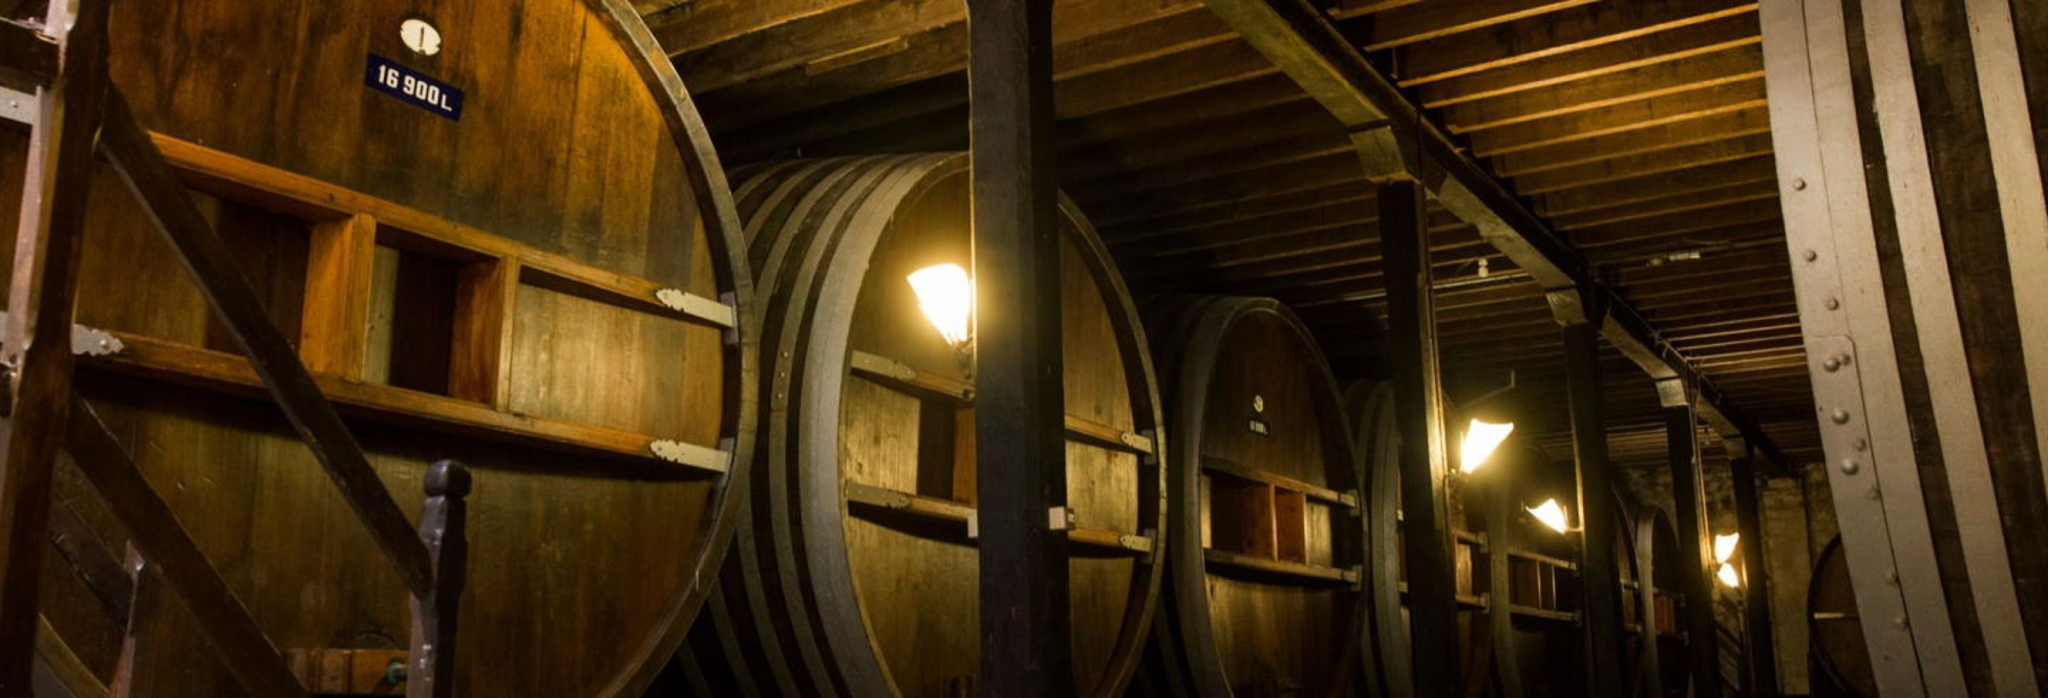 Visite du domaine viticole Viña Varela Zarranz